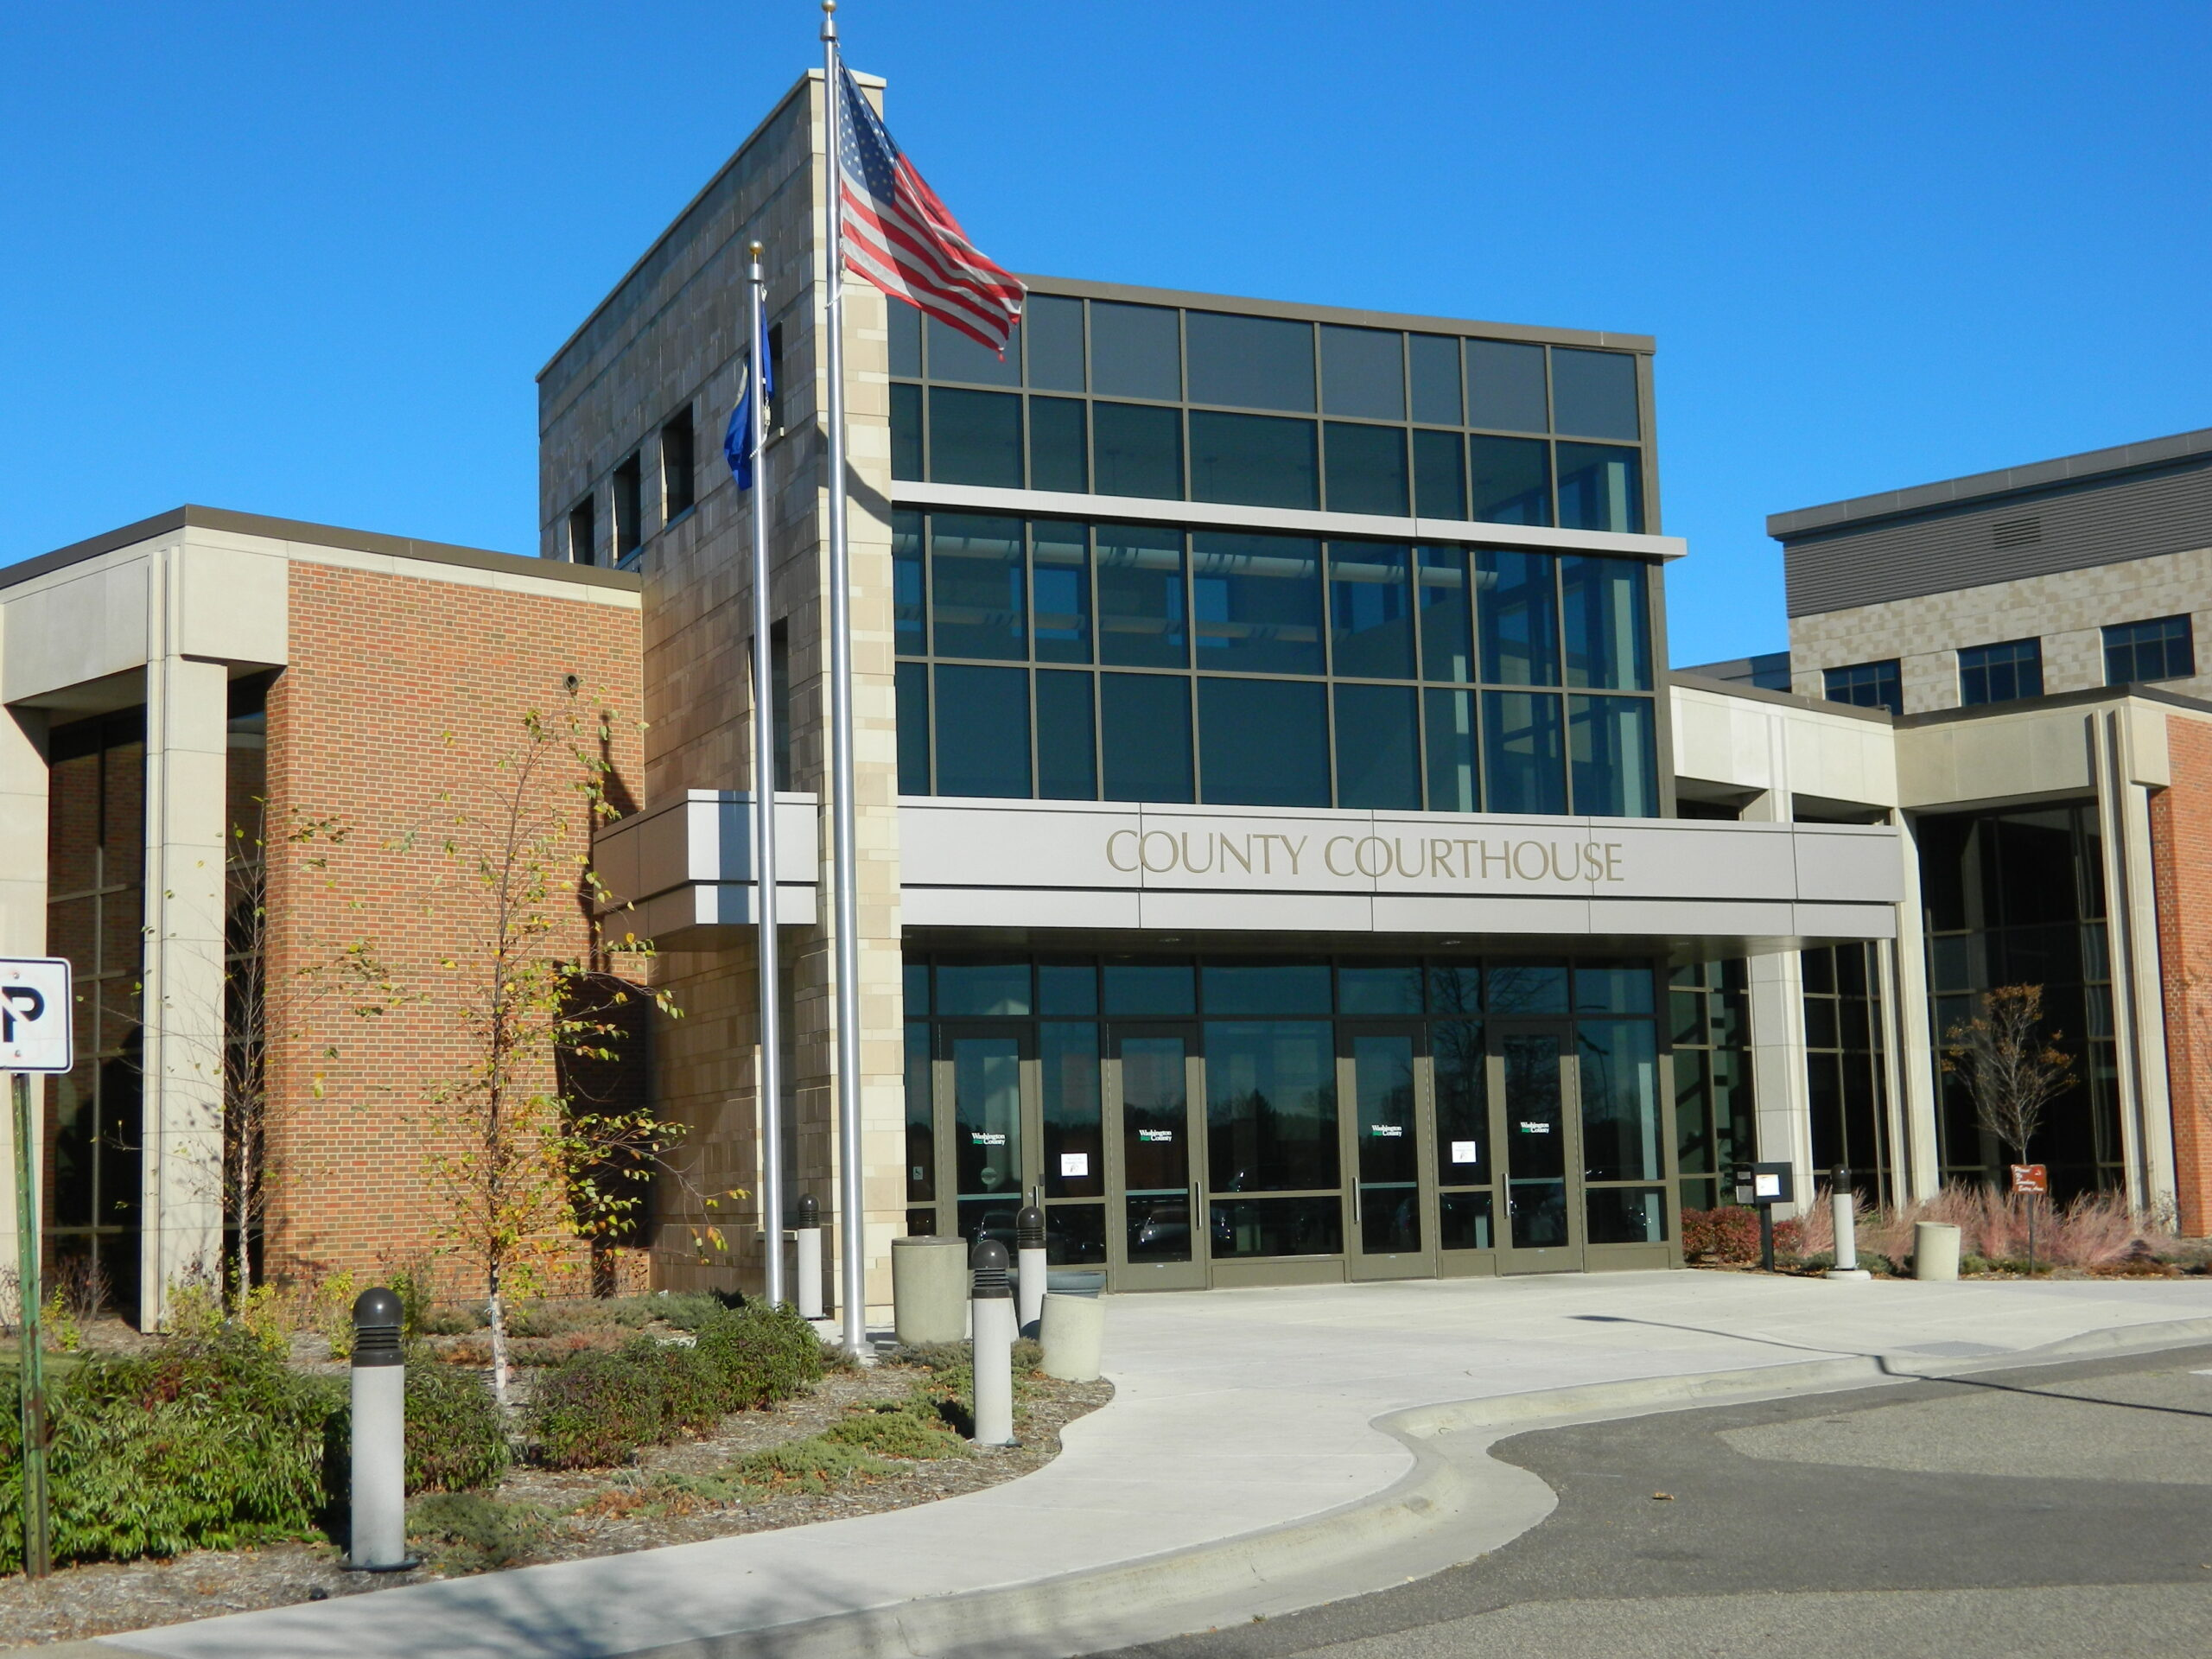 courthouse-outside-photo-10-31-12-008_201312271027087153-4494021